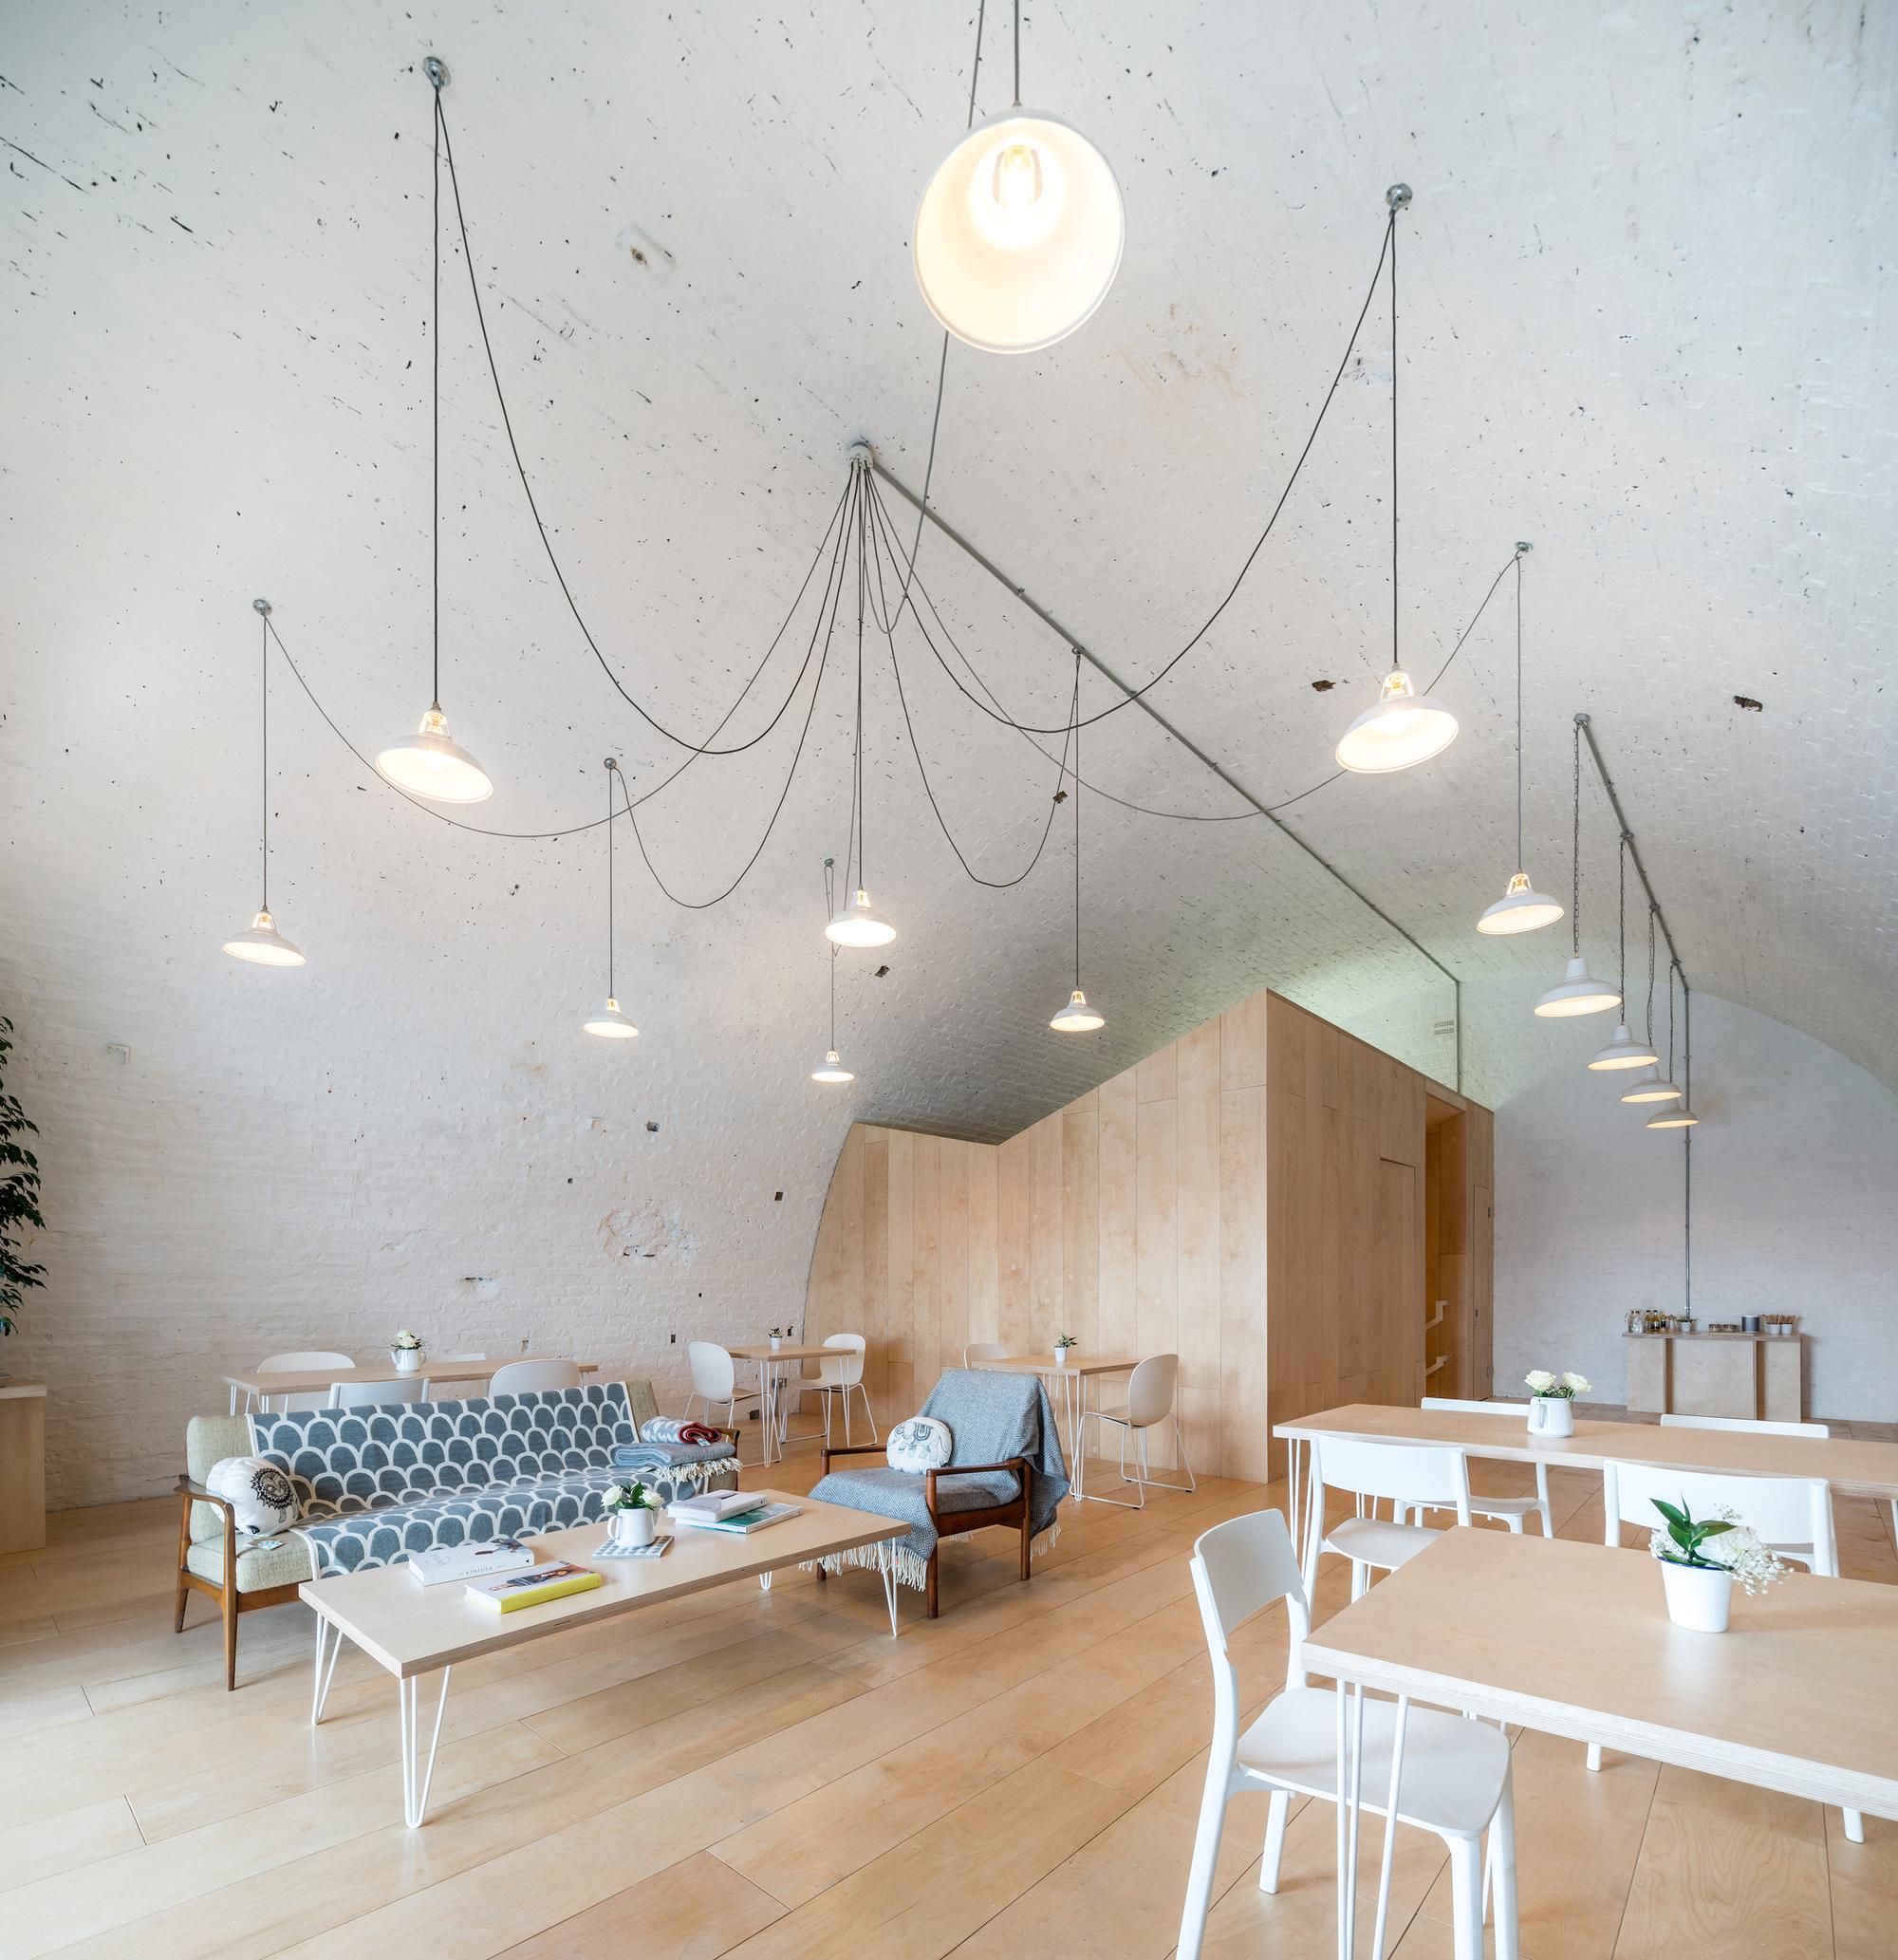 Galeria de loja archive haptic architects 1 for Swedish design shop